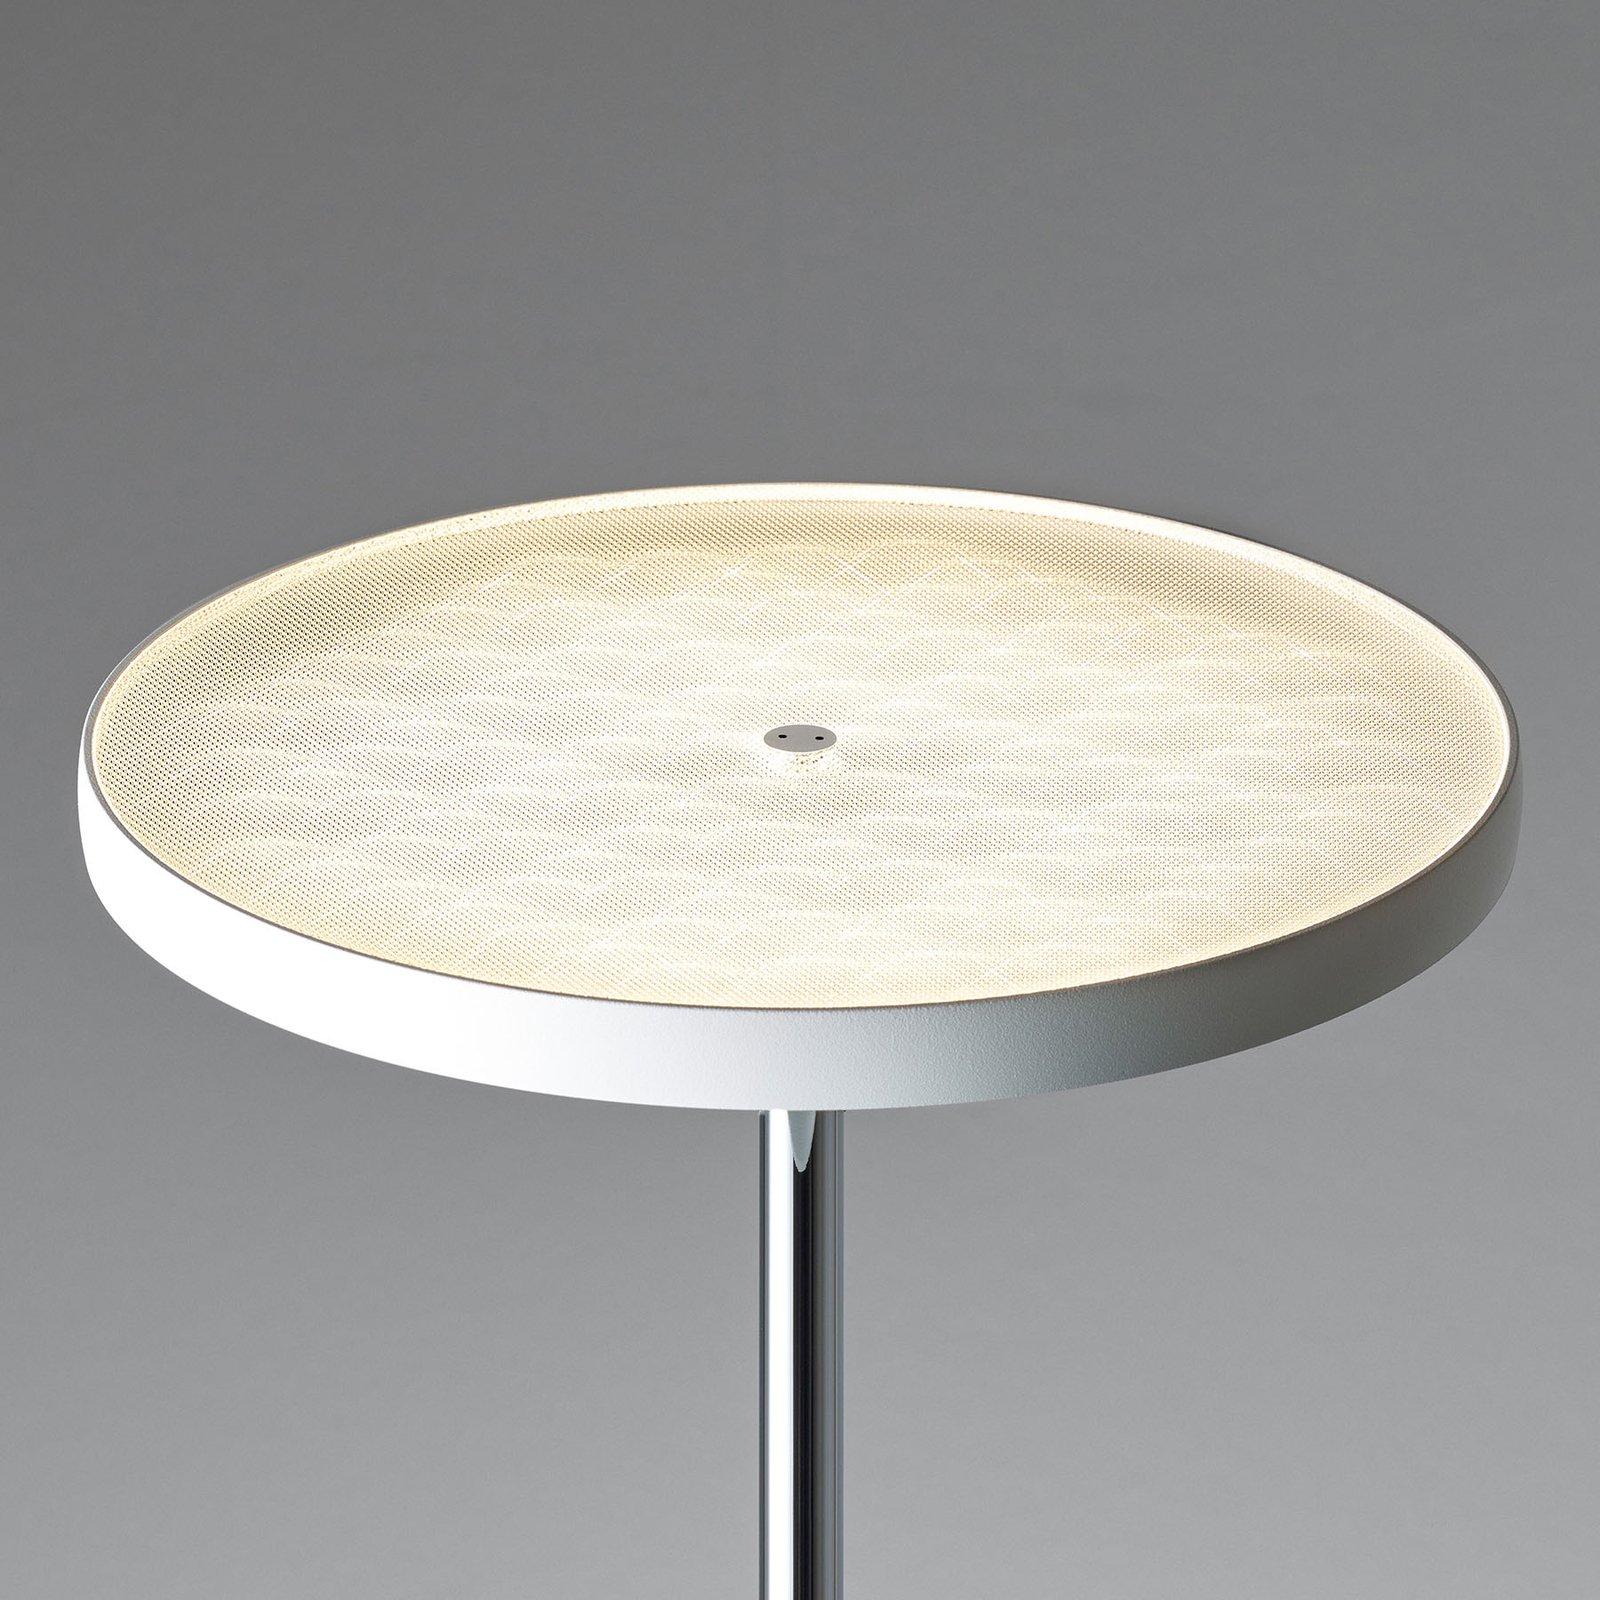 OLIGO Decent Max LED-gulvlampe, hvit matt